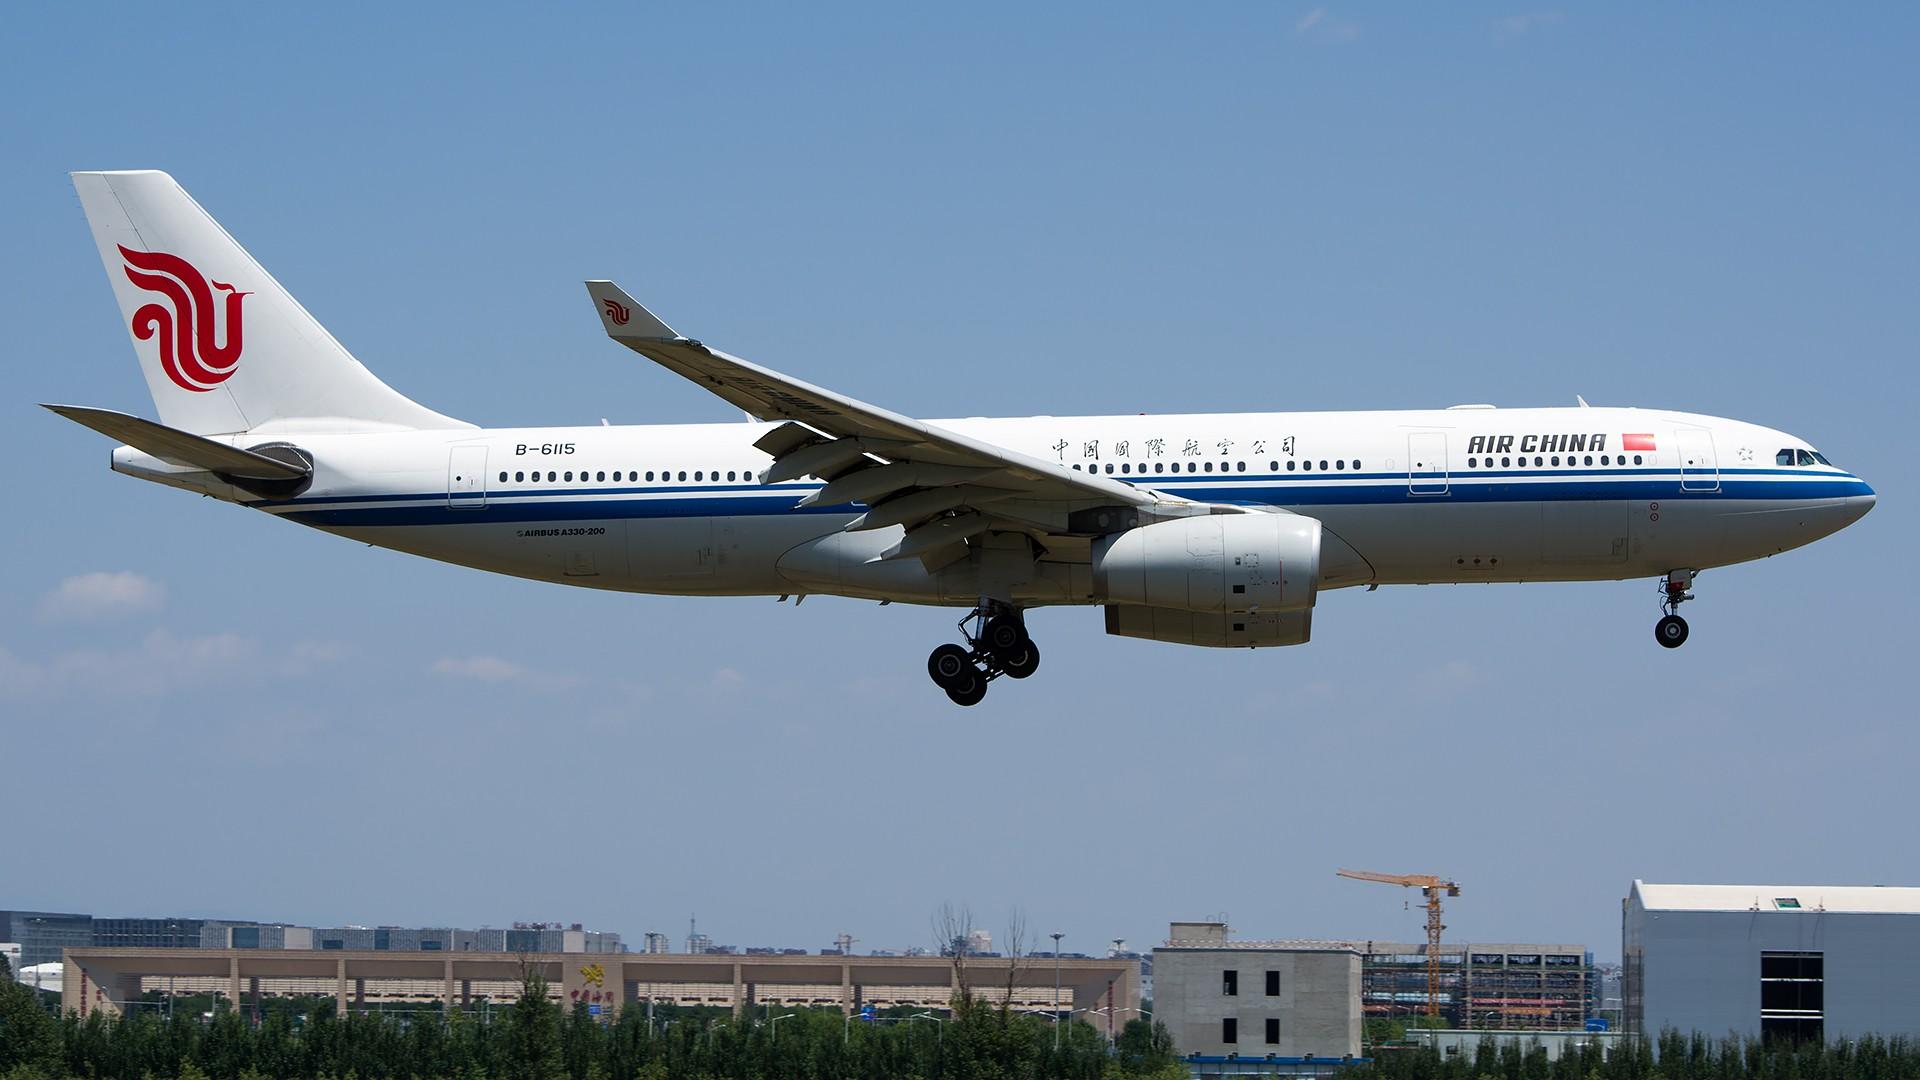 Re:[原创]高空低涡最后一天的PEK杂图【2015-6-14】 AIRBUS A330-200 B-6115 中国北京首都国际机场